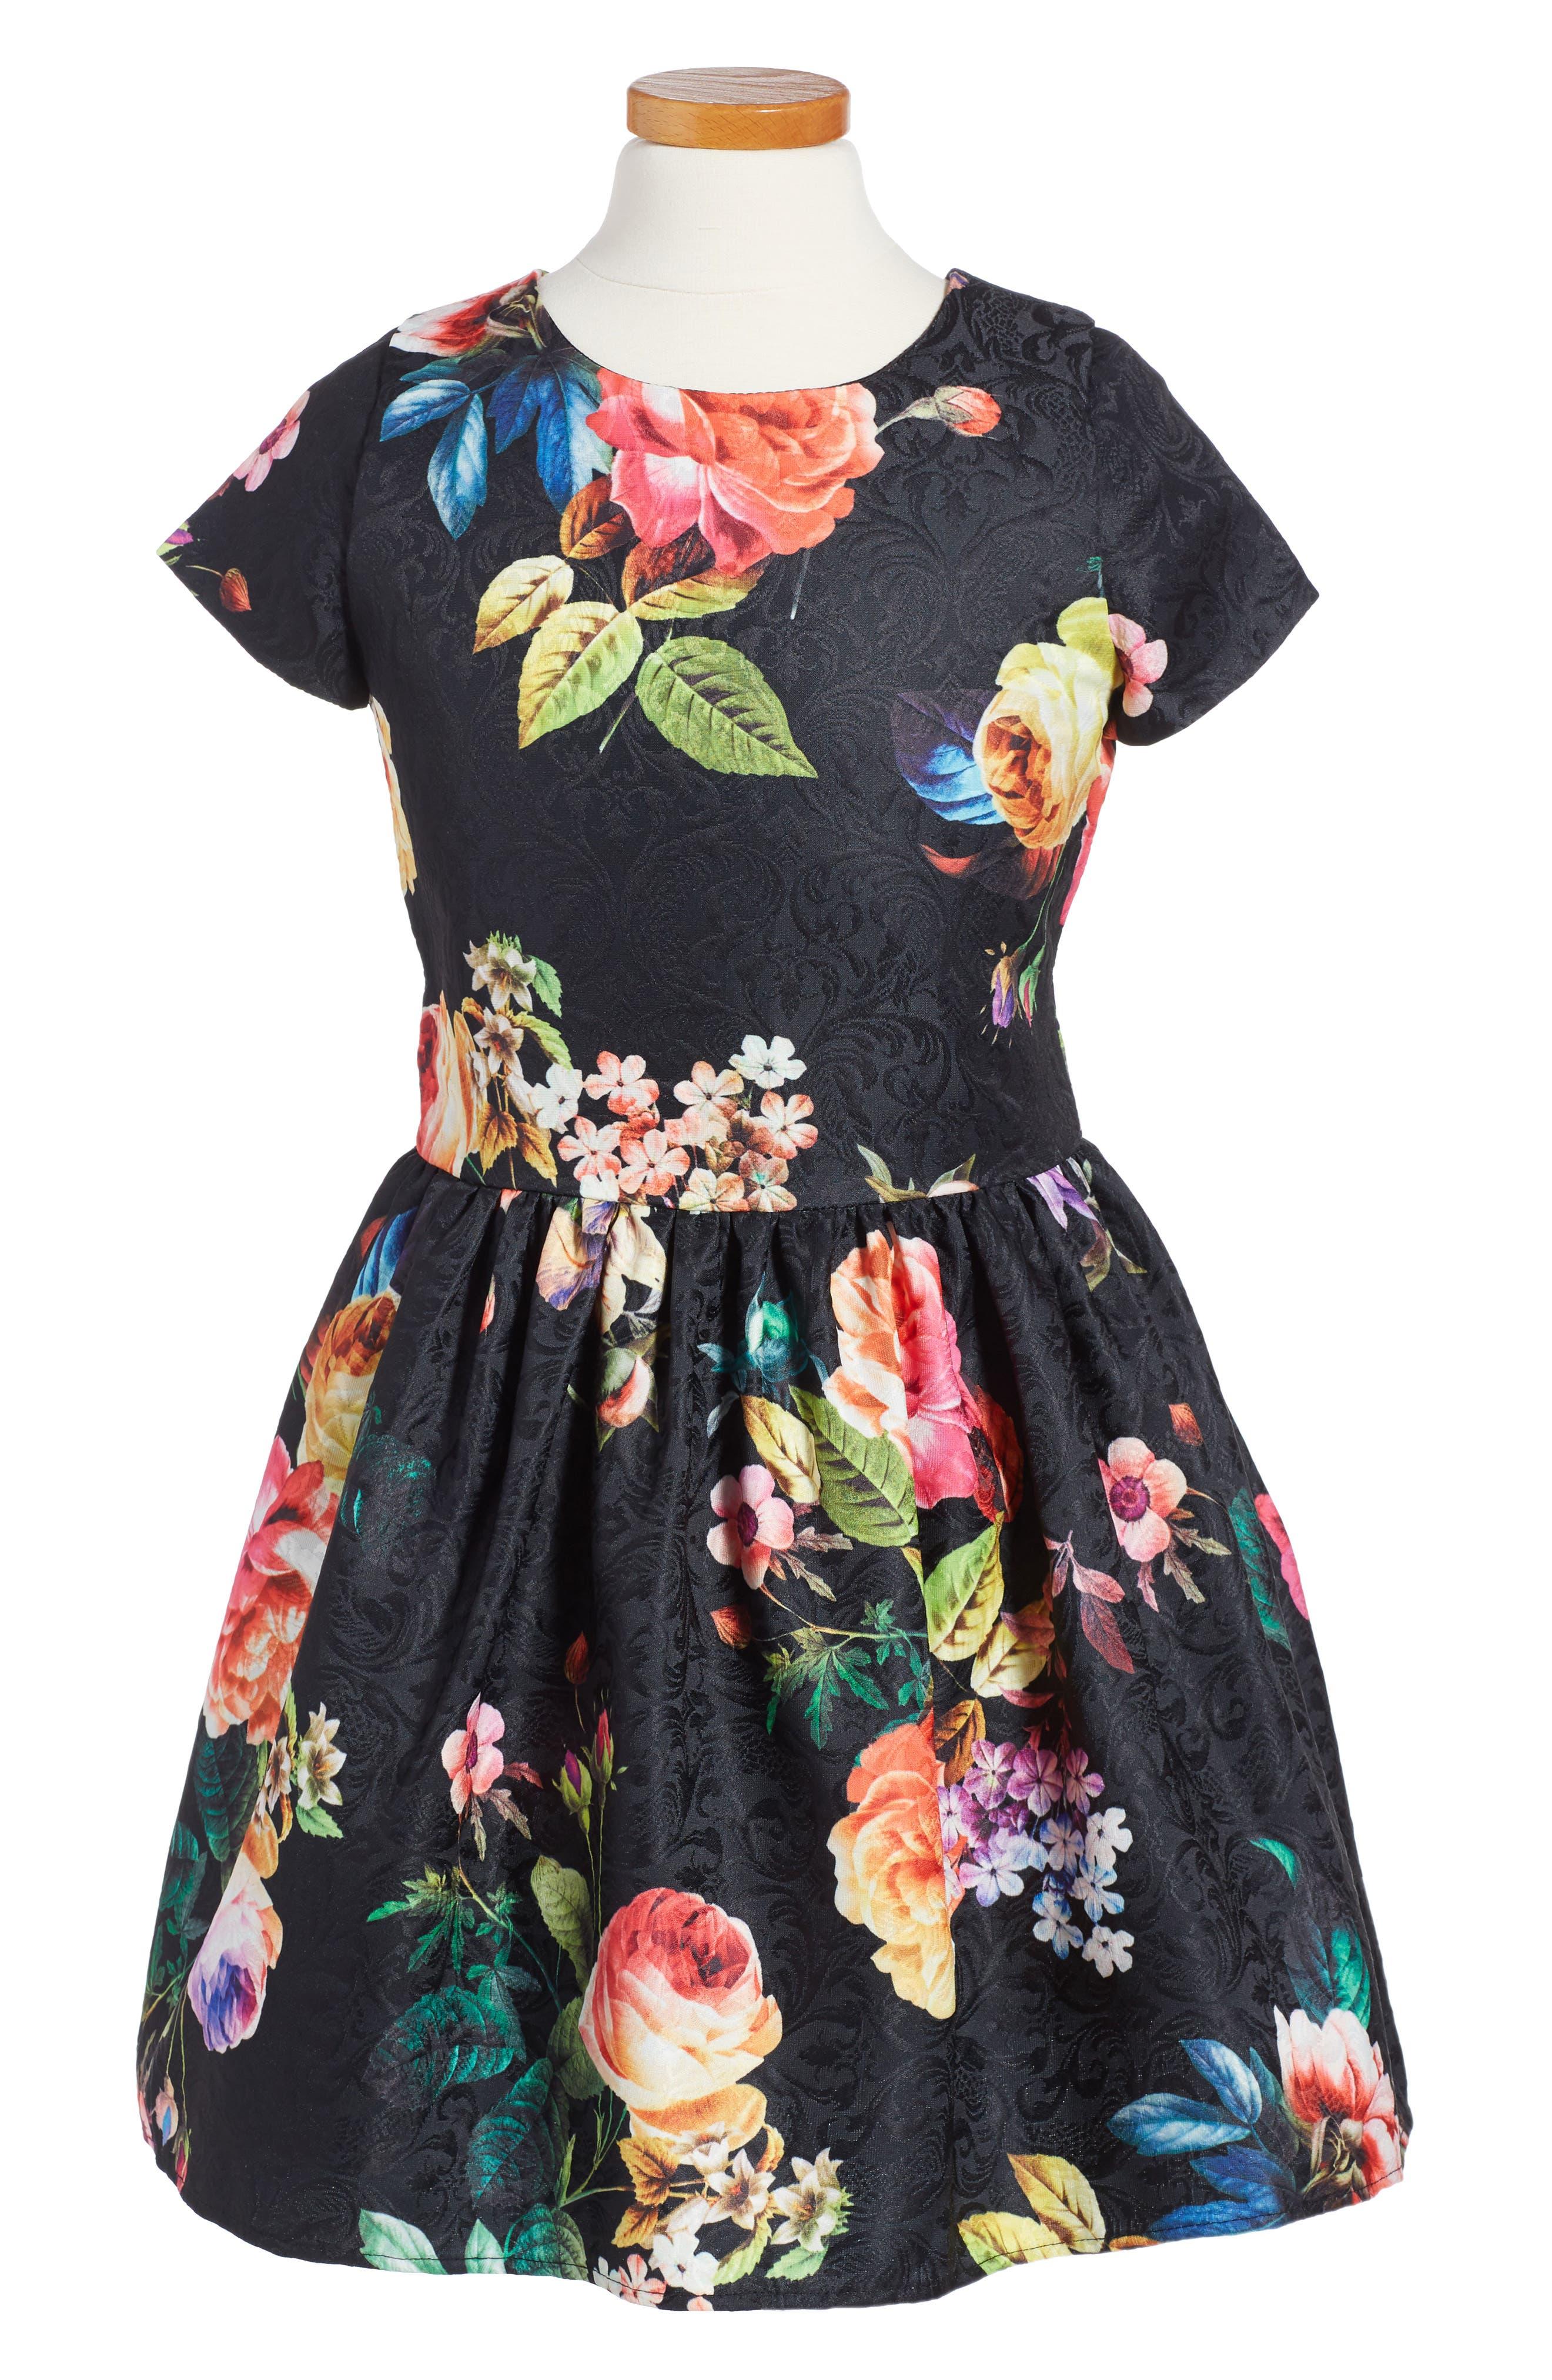 Main Image - Ava & Yelly Floral Brocade Dress (Big Girls)